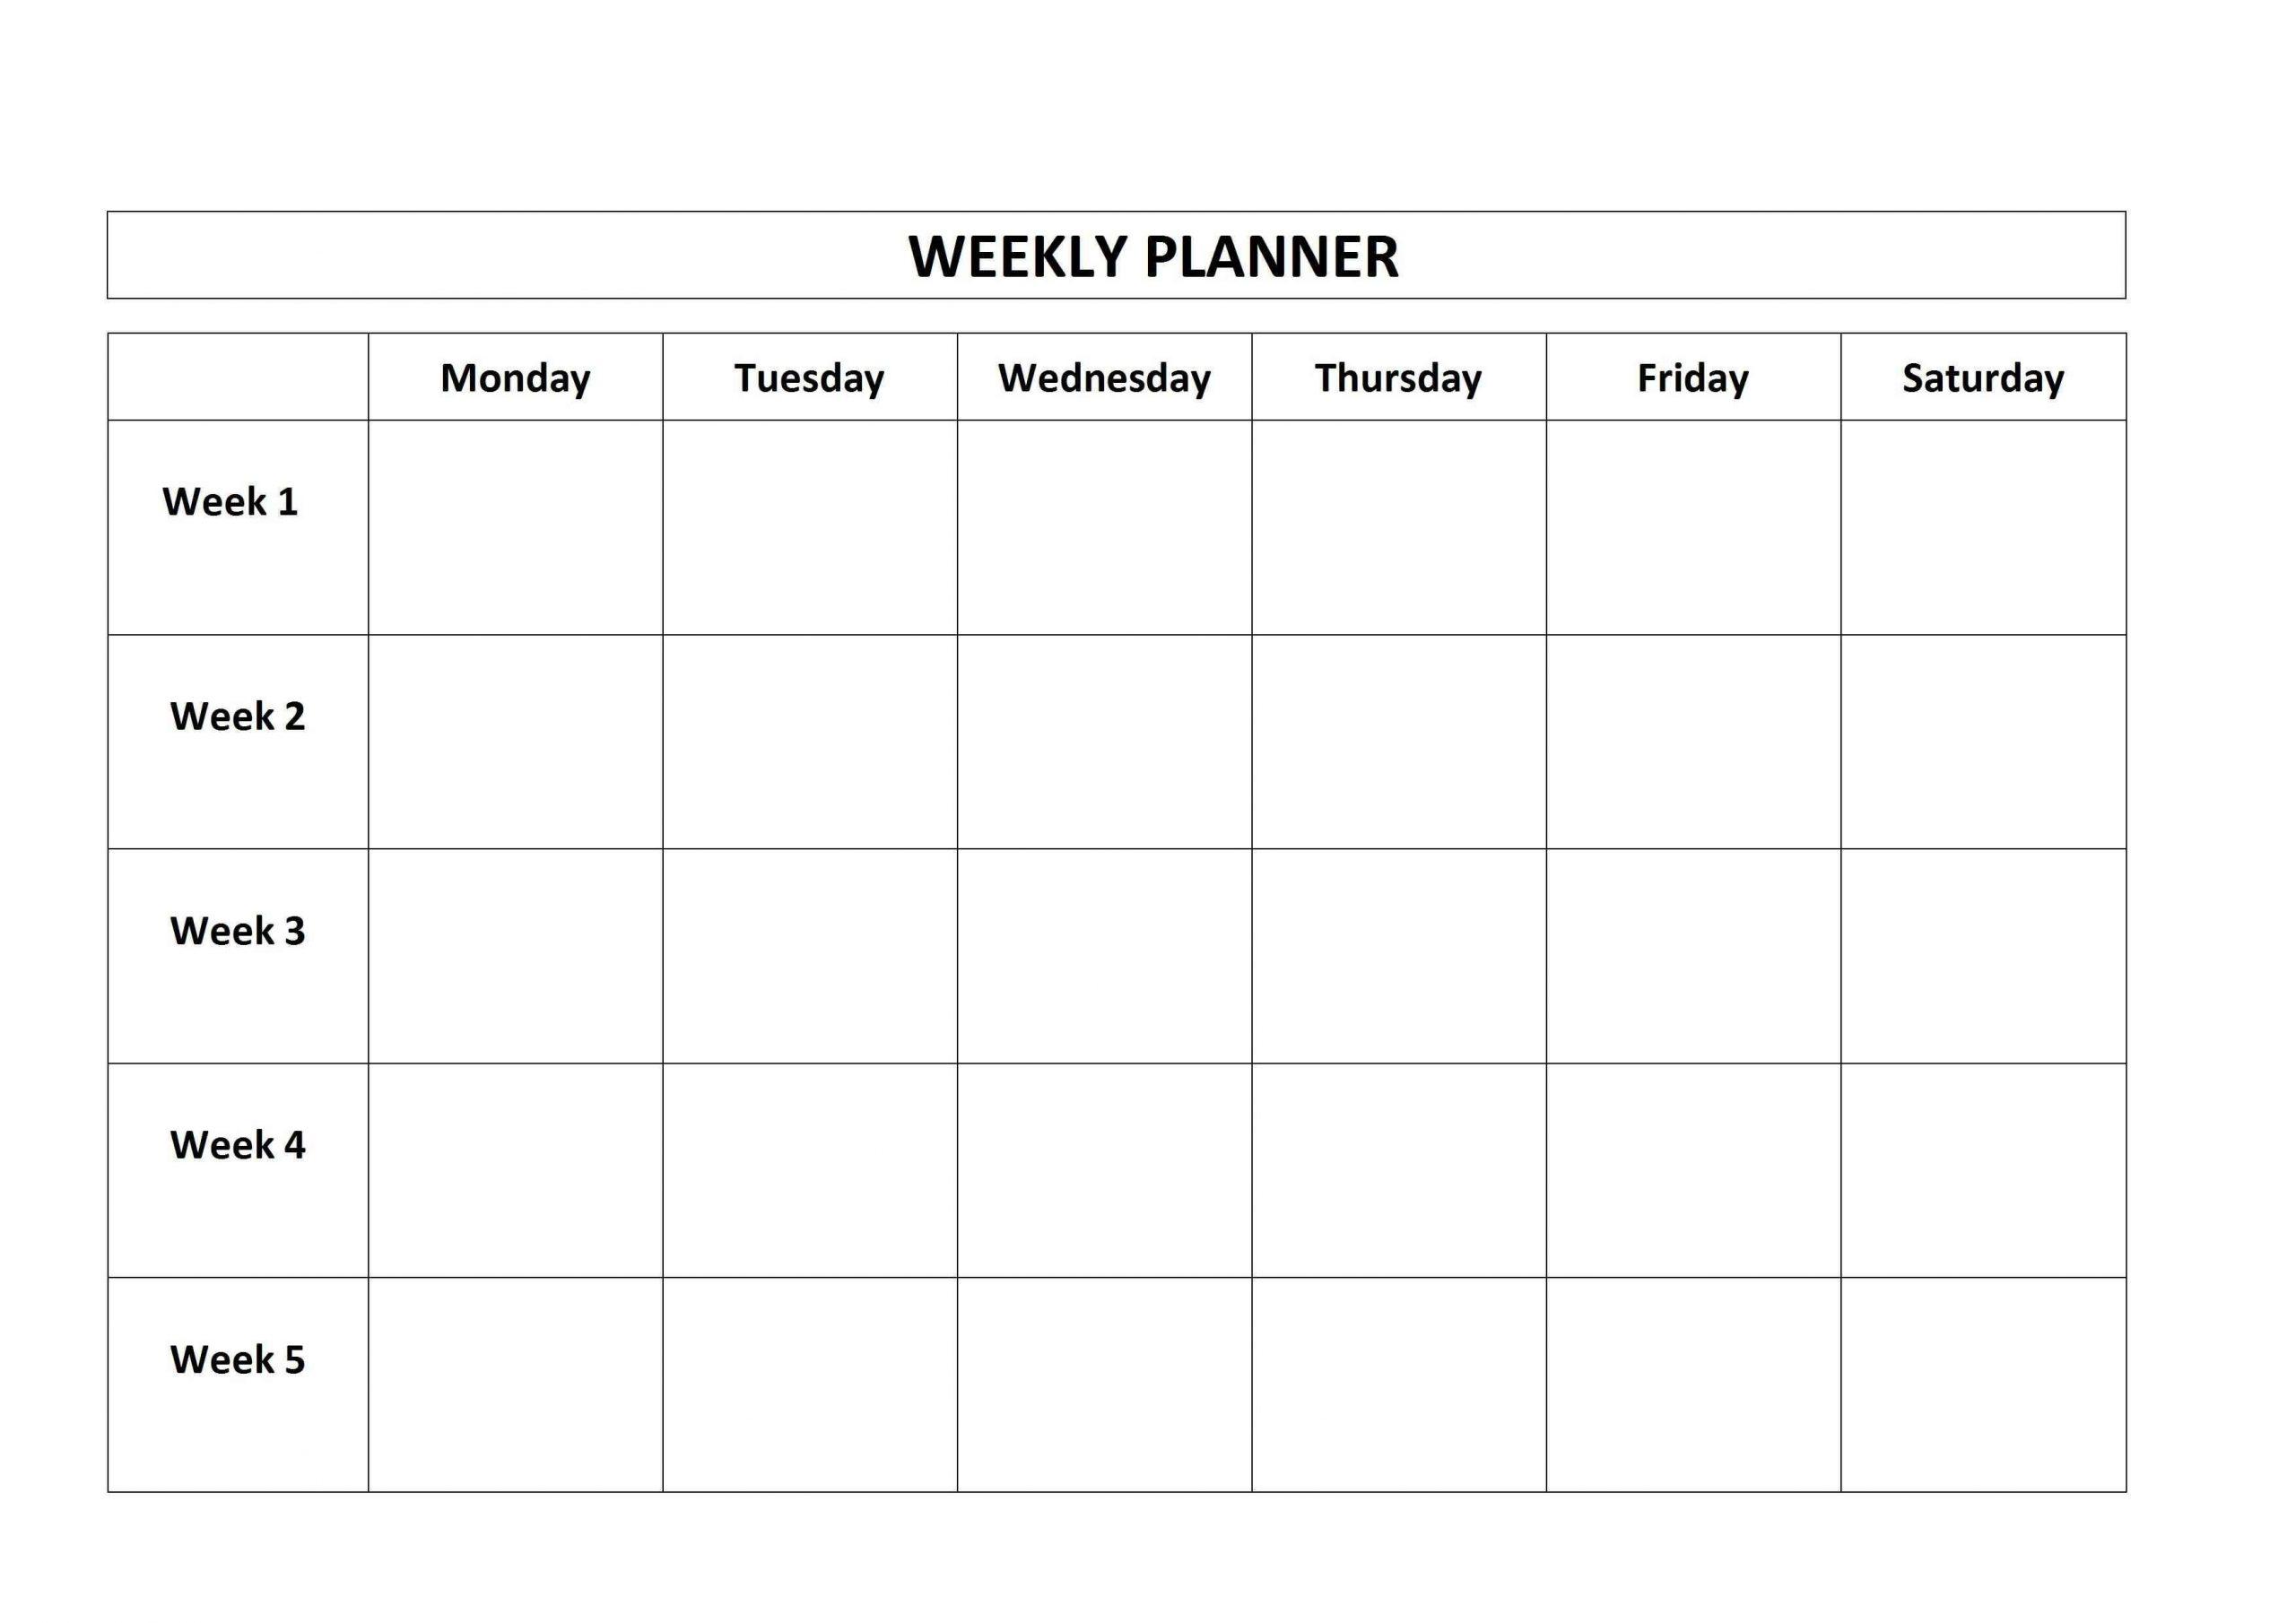 Monday To Friday Blank Calendar Printable | Calendar Printable Schedule Mon To Friday